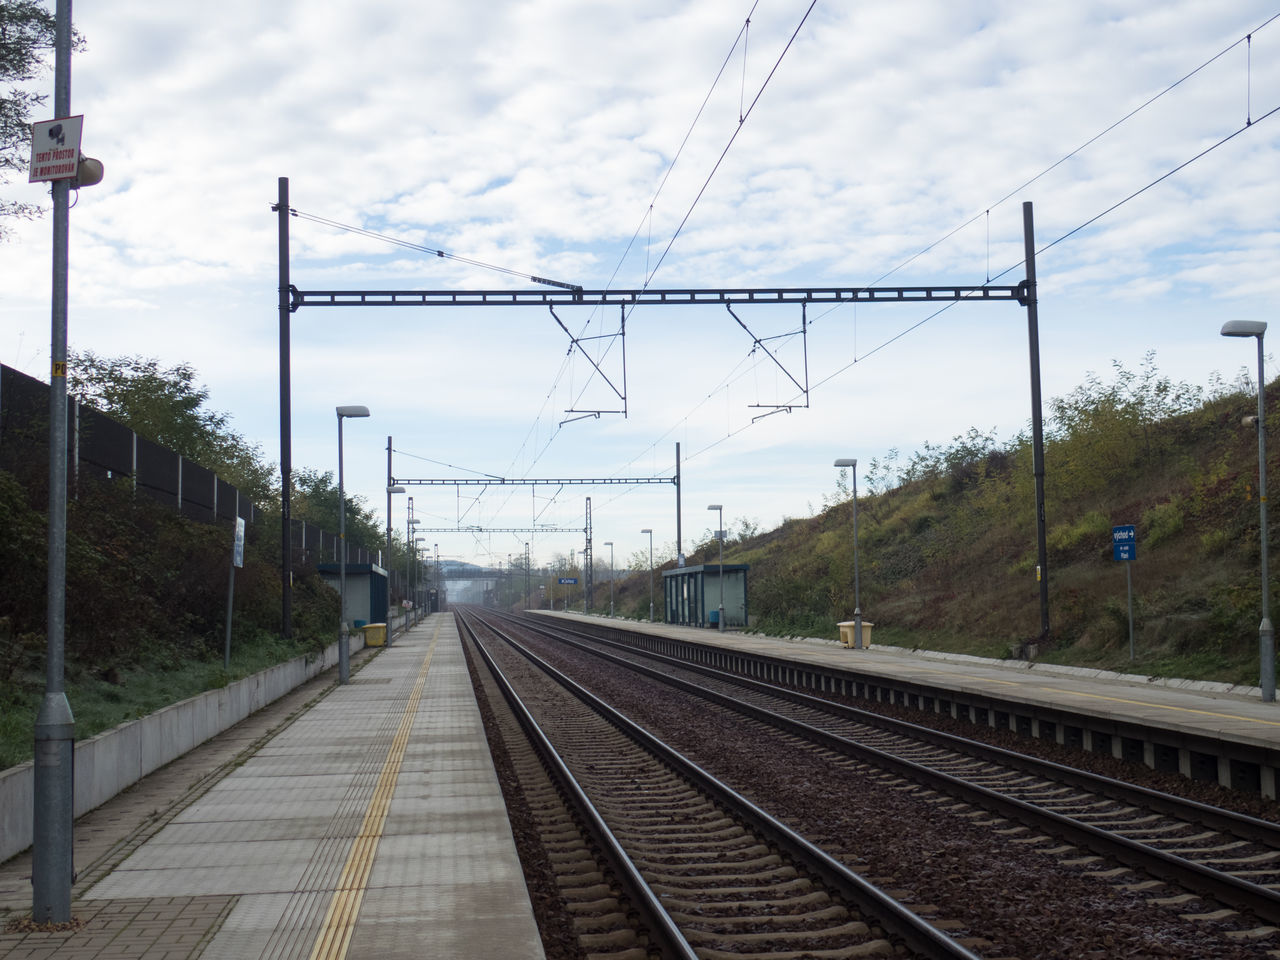 Leading Lines Leading The Way The Way Forward Train Train Station Train Tracks